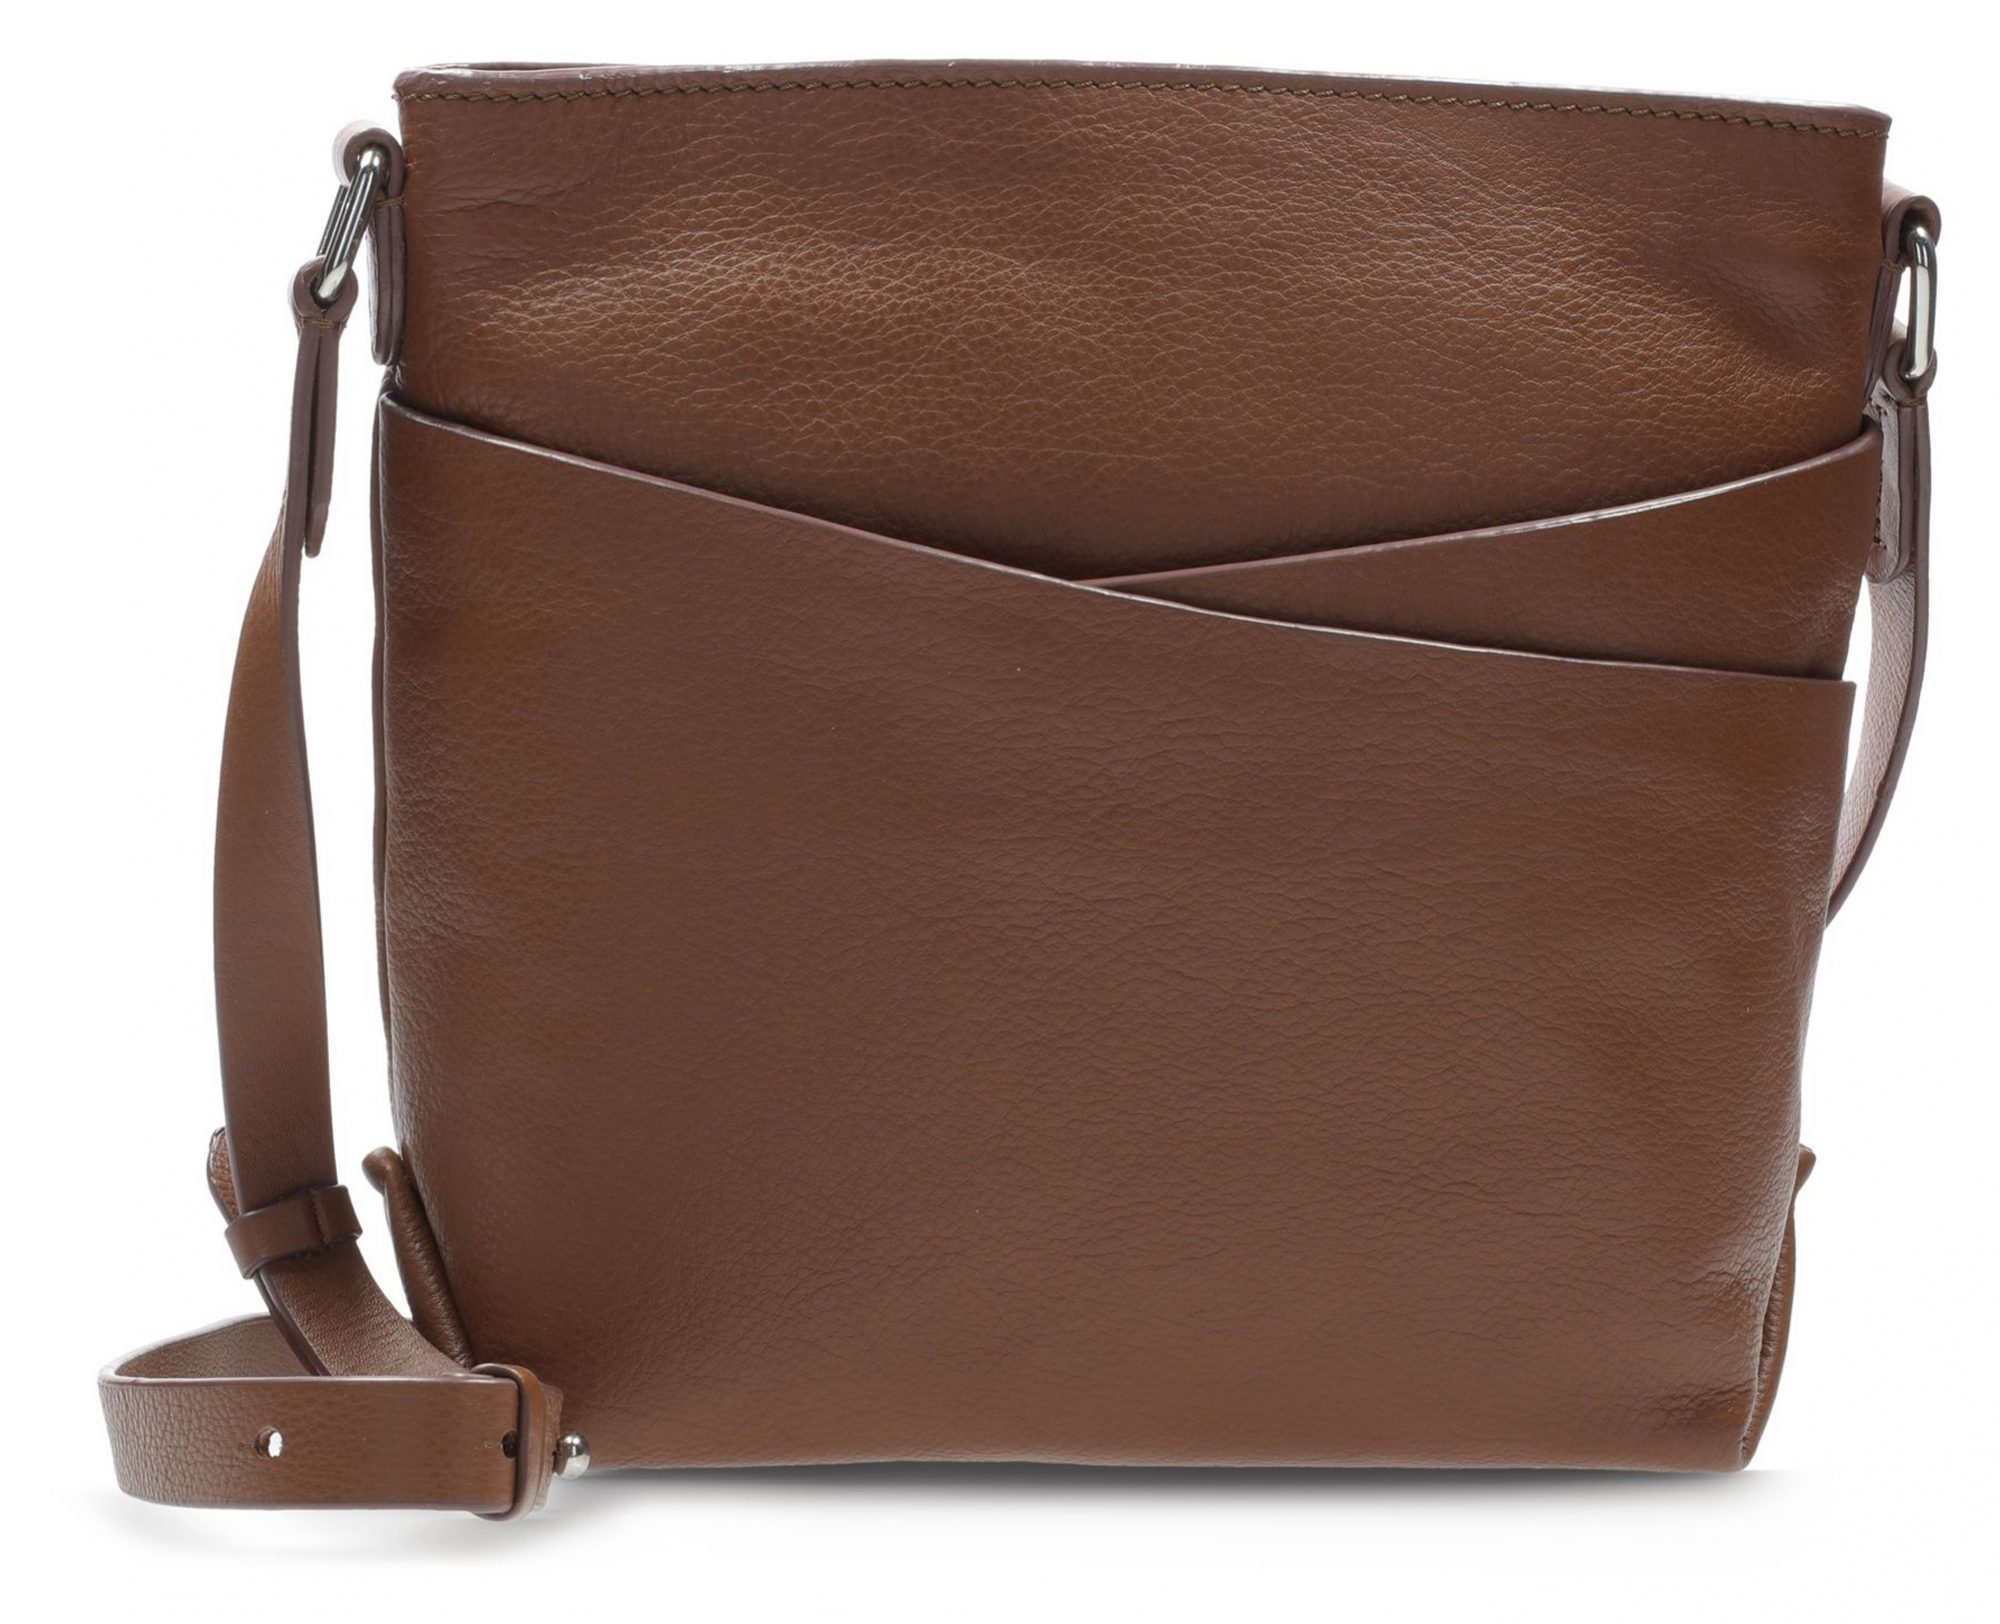 6089cd3e3f4 Clarks Topsham Charm Tan Leather 26141358 - Cross Body Bags - Humphries  Shoes